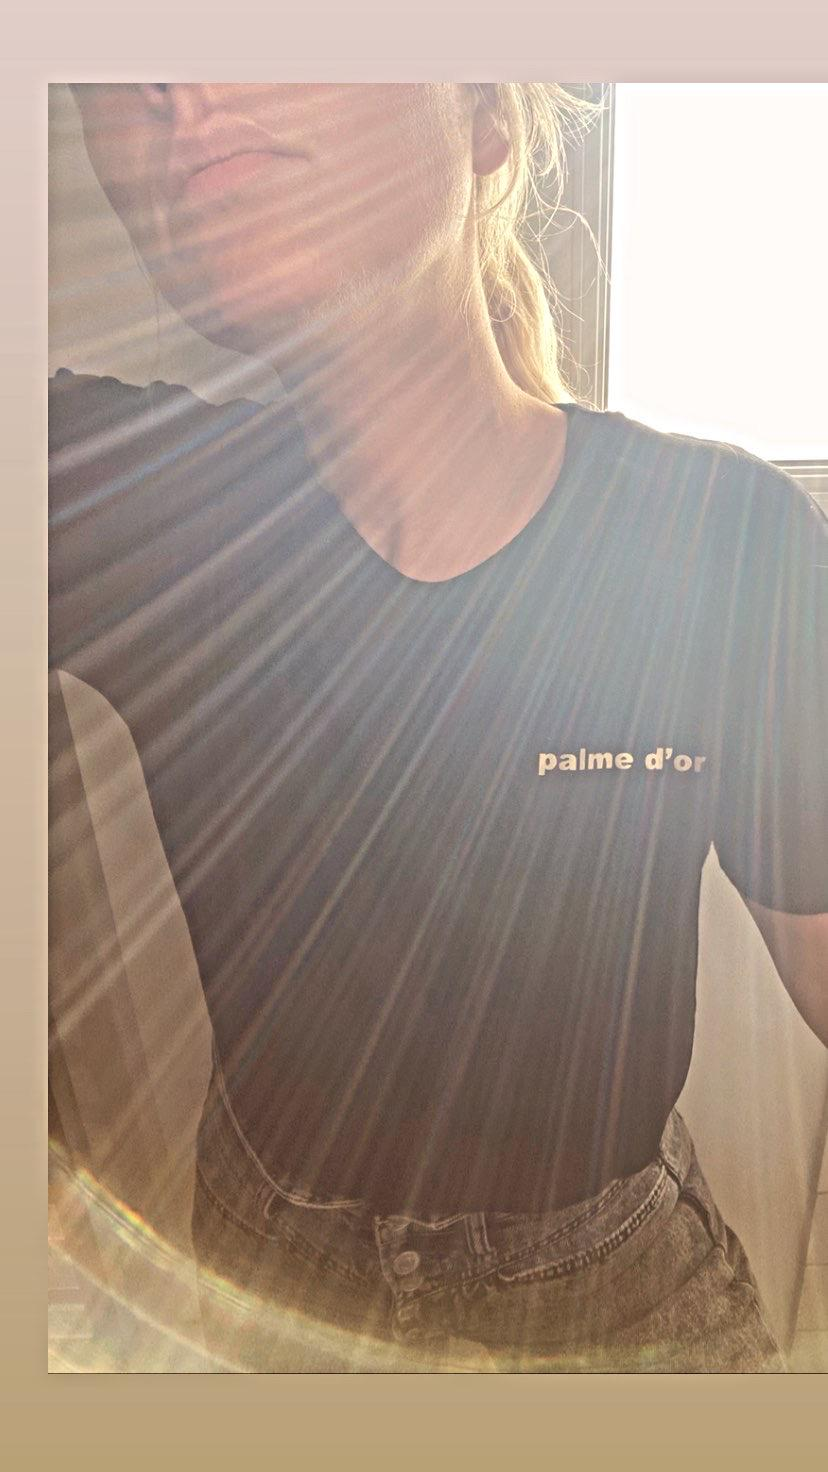 Image of Tee-shirt Palme d'or